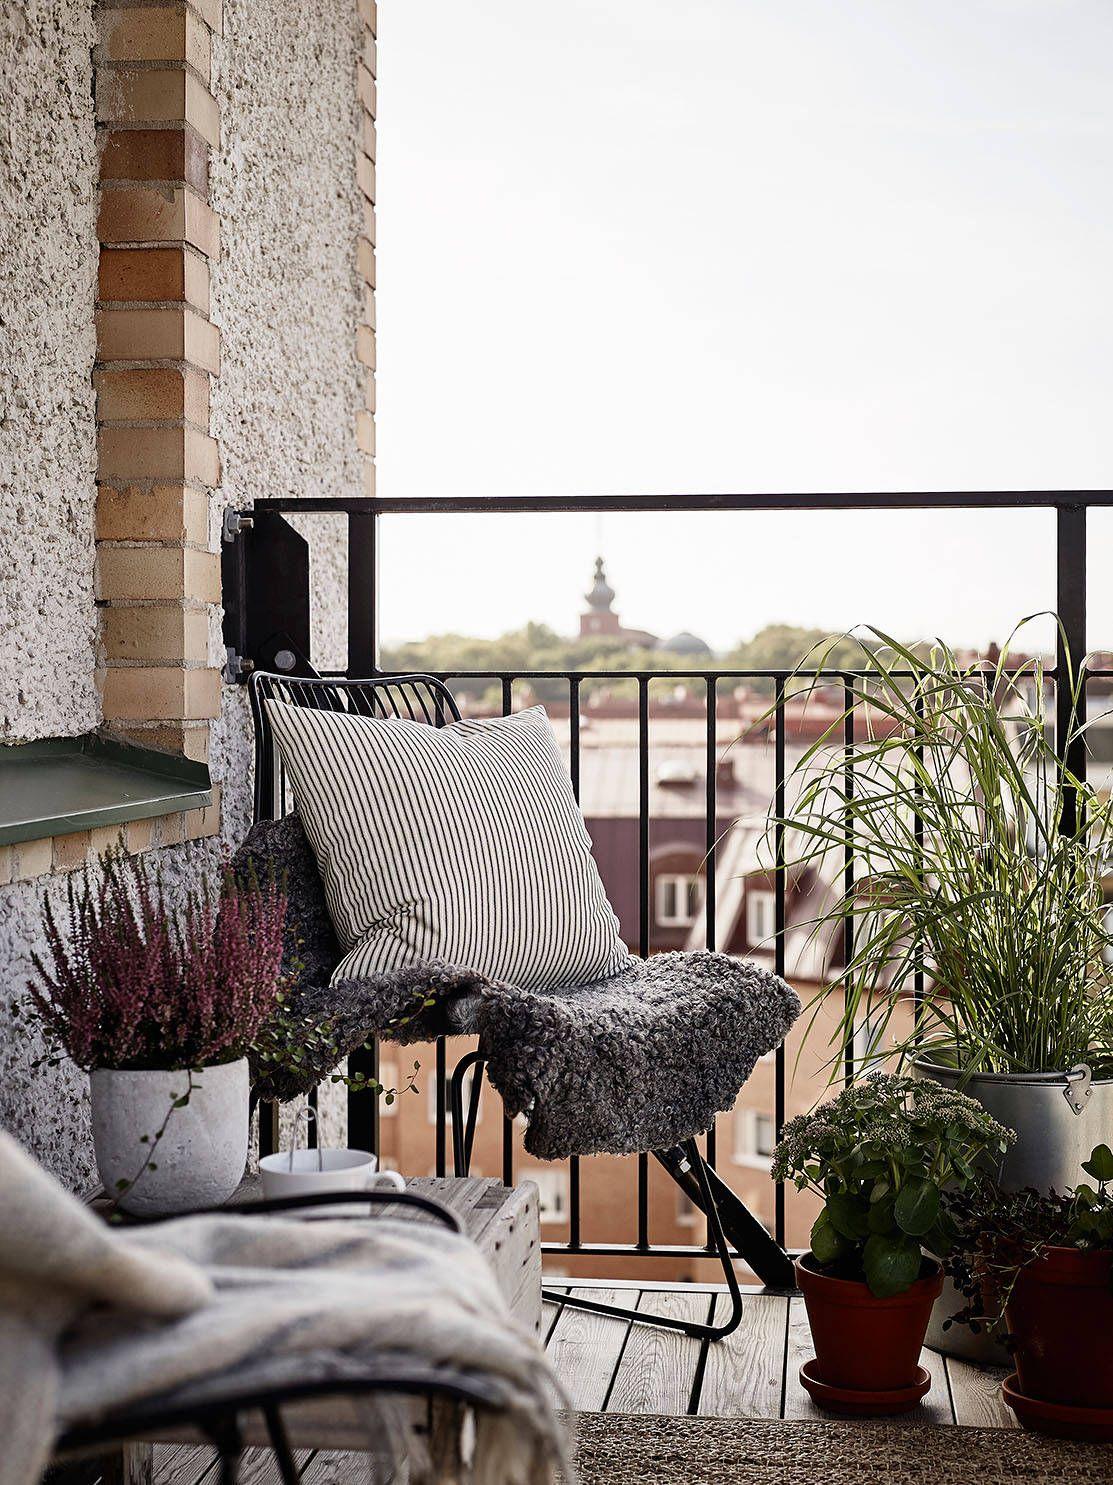 Kleines haus zu hause exterieur-design Övre majorsgatan c  stadshem  home ideas  pinterest  balkon